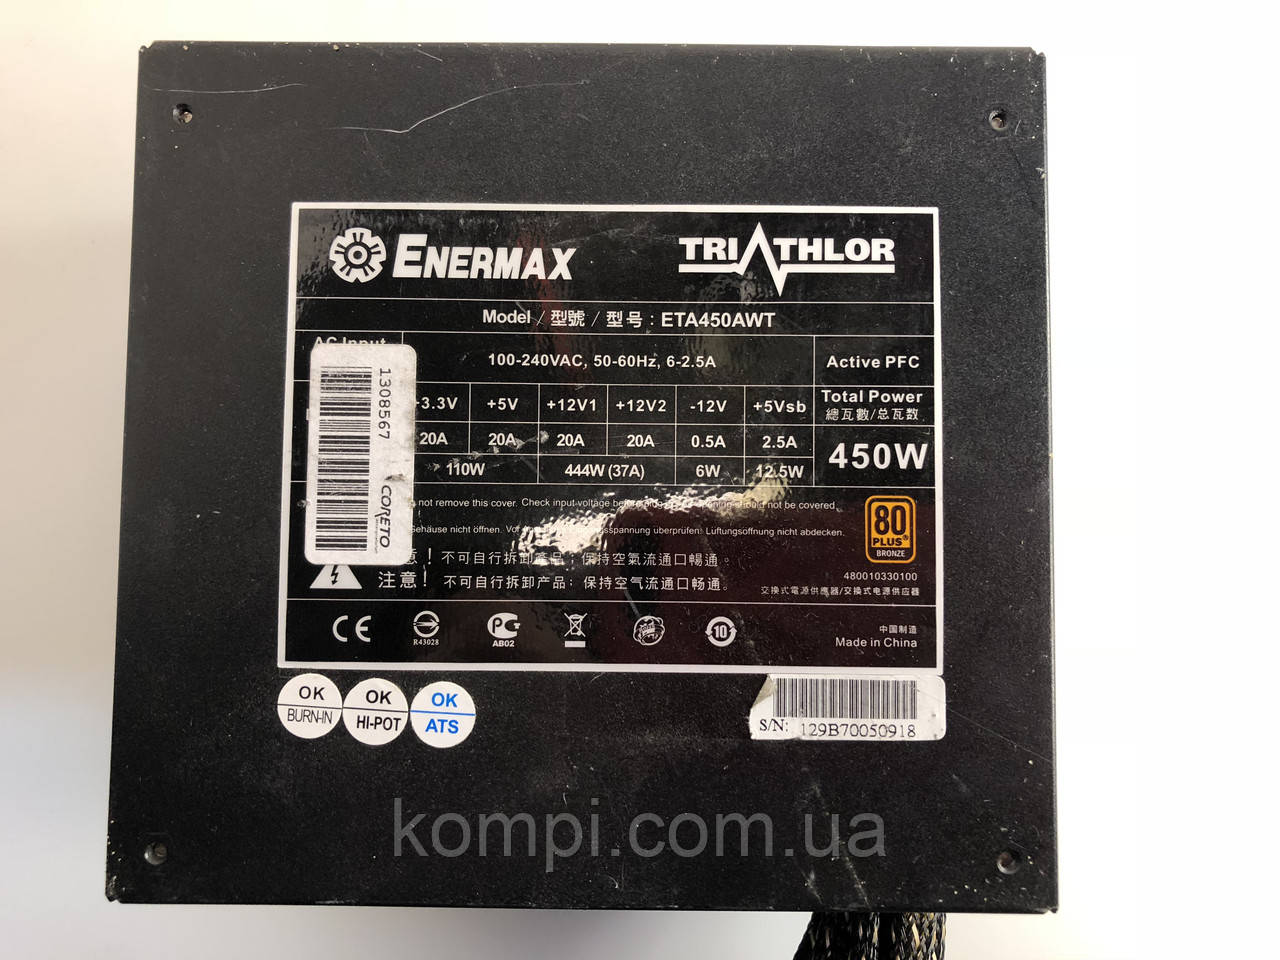 Блок питания  Enermax TRIATHLOR 450W (ETA450AWT) 80 plus  б/у